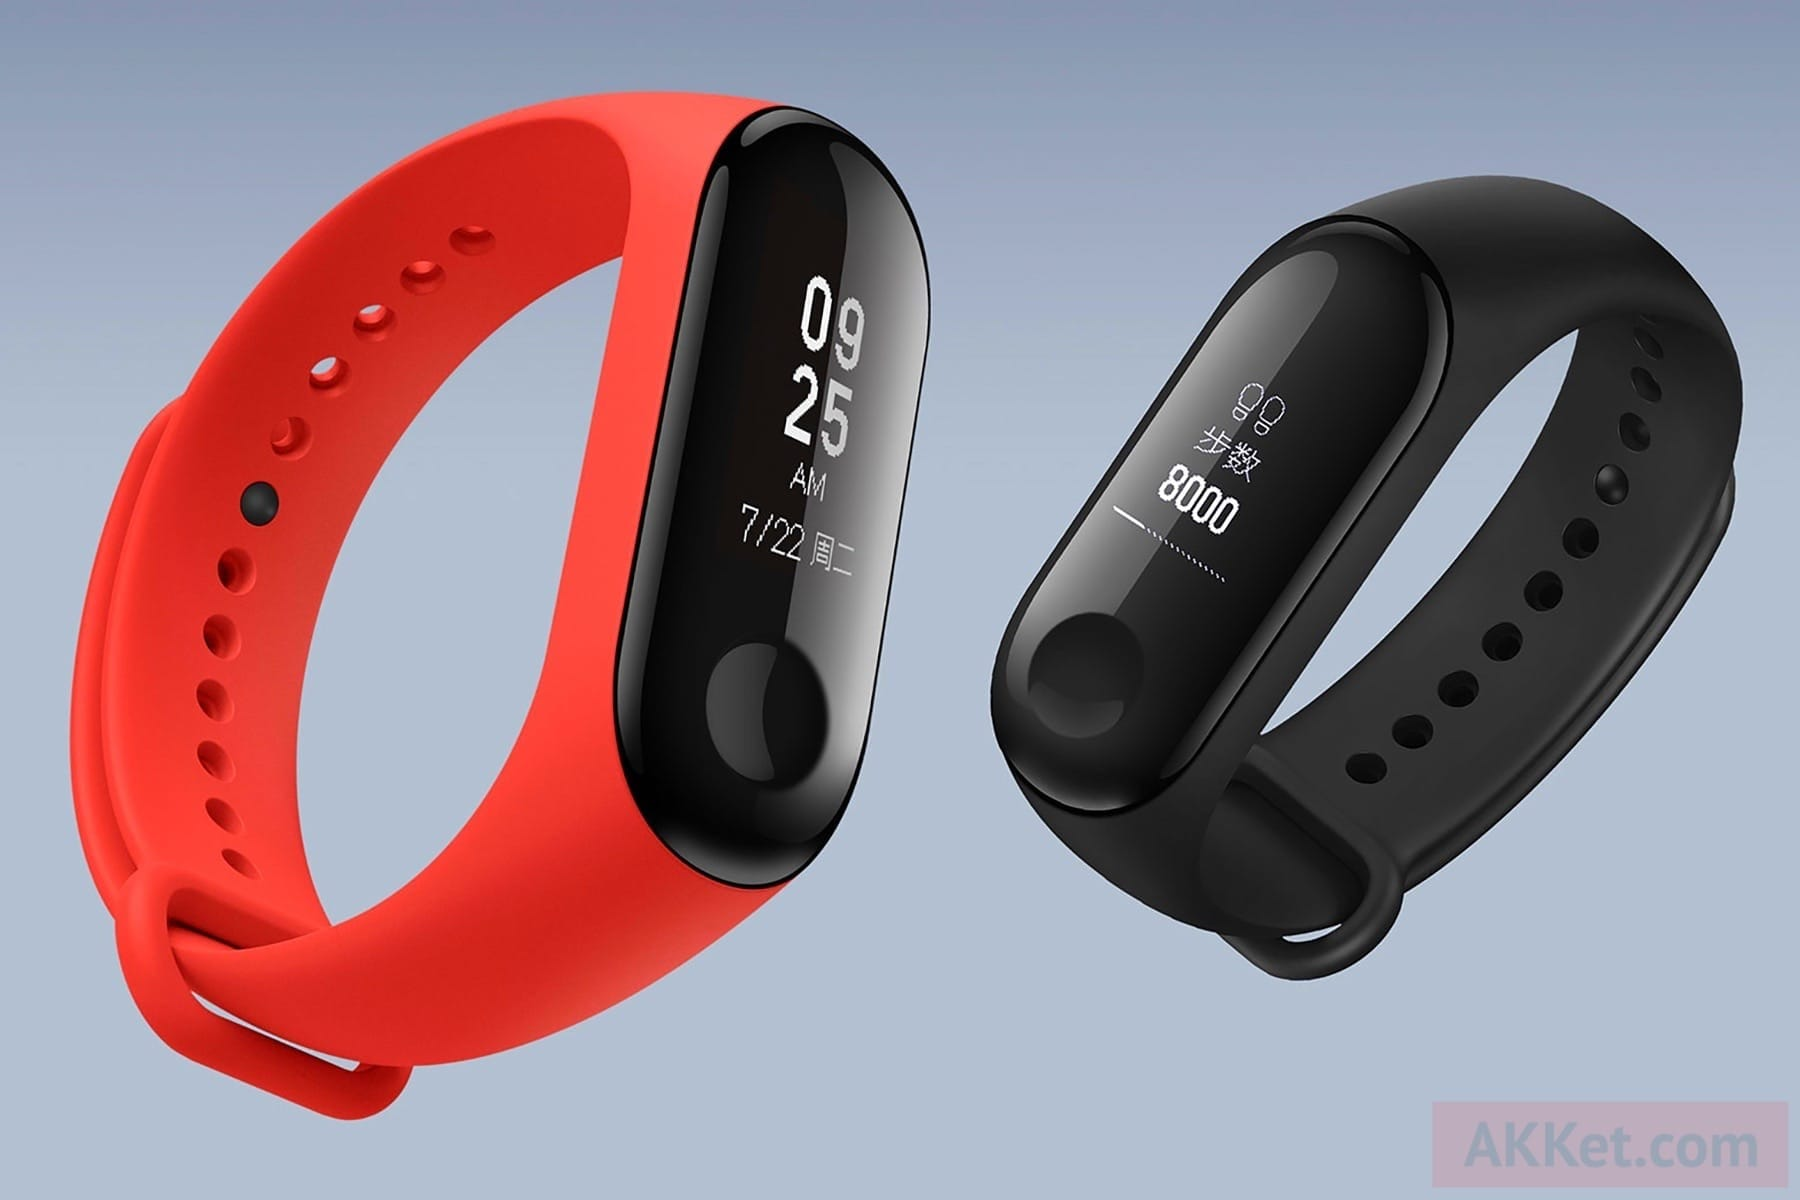 Фитнес-браслет Xiaomi MiBand стал втри раза дешевле в РФ